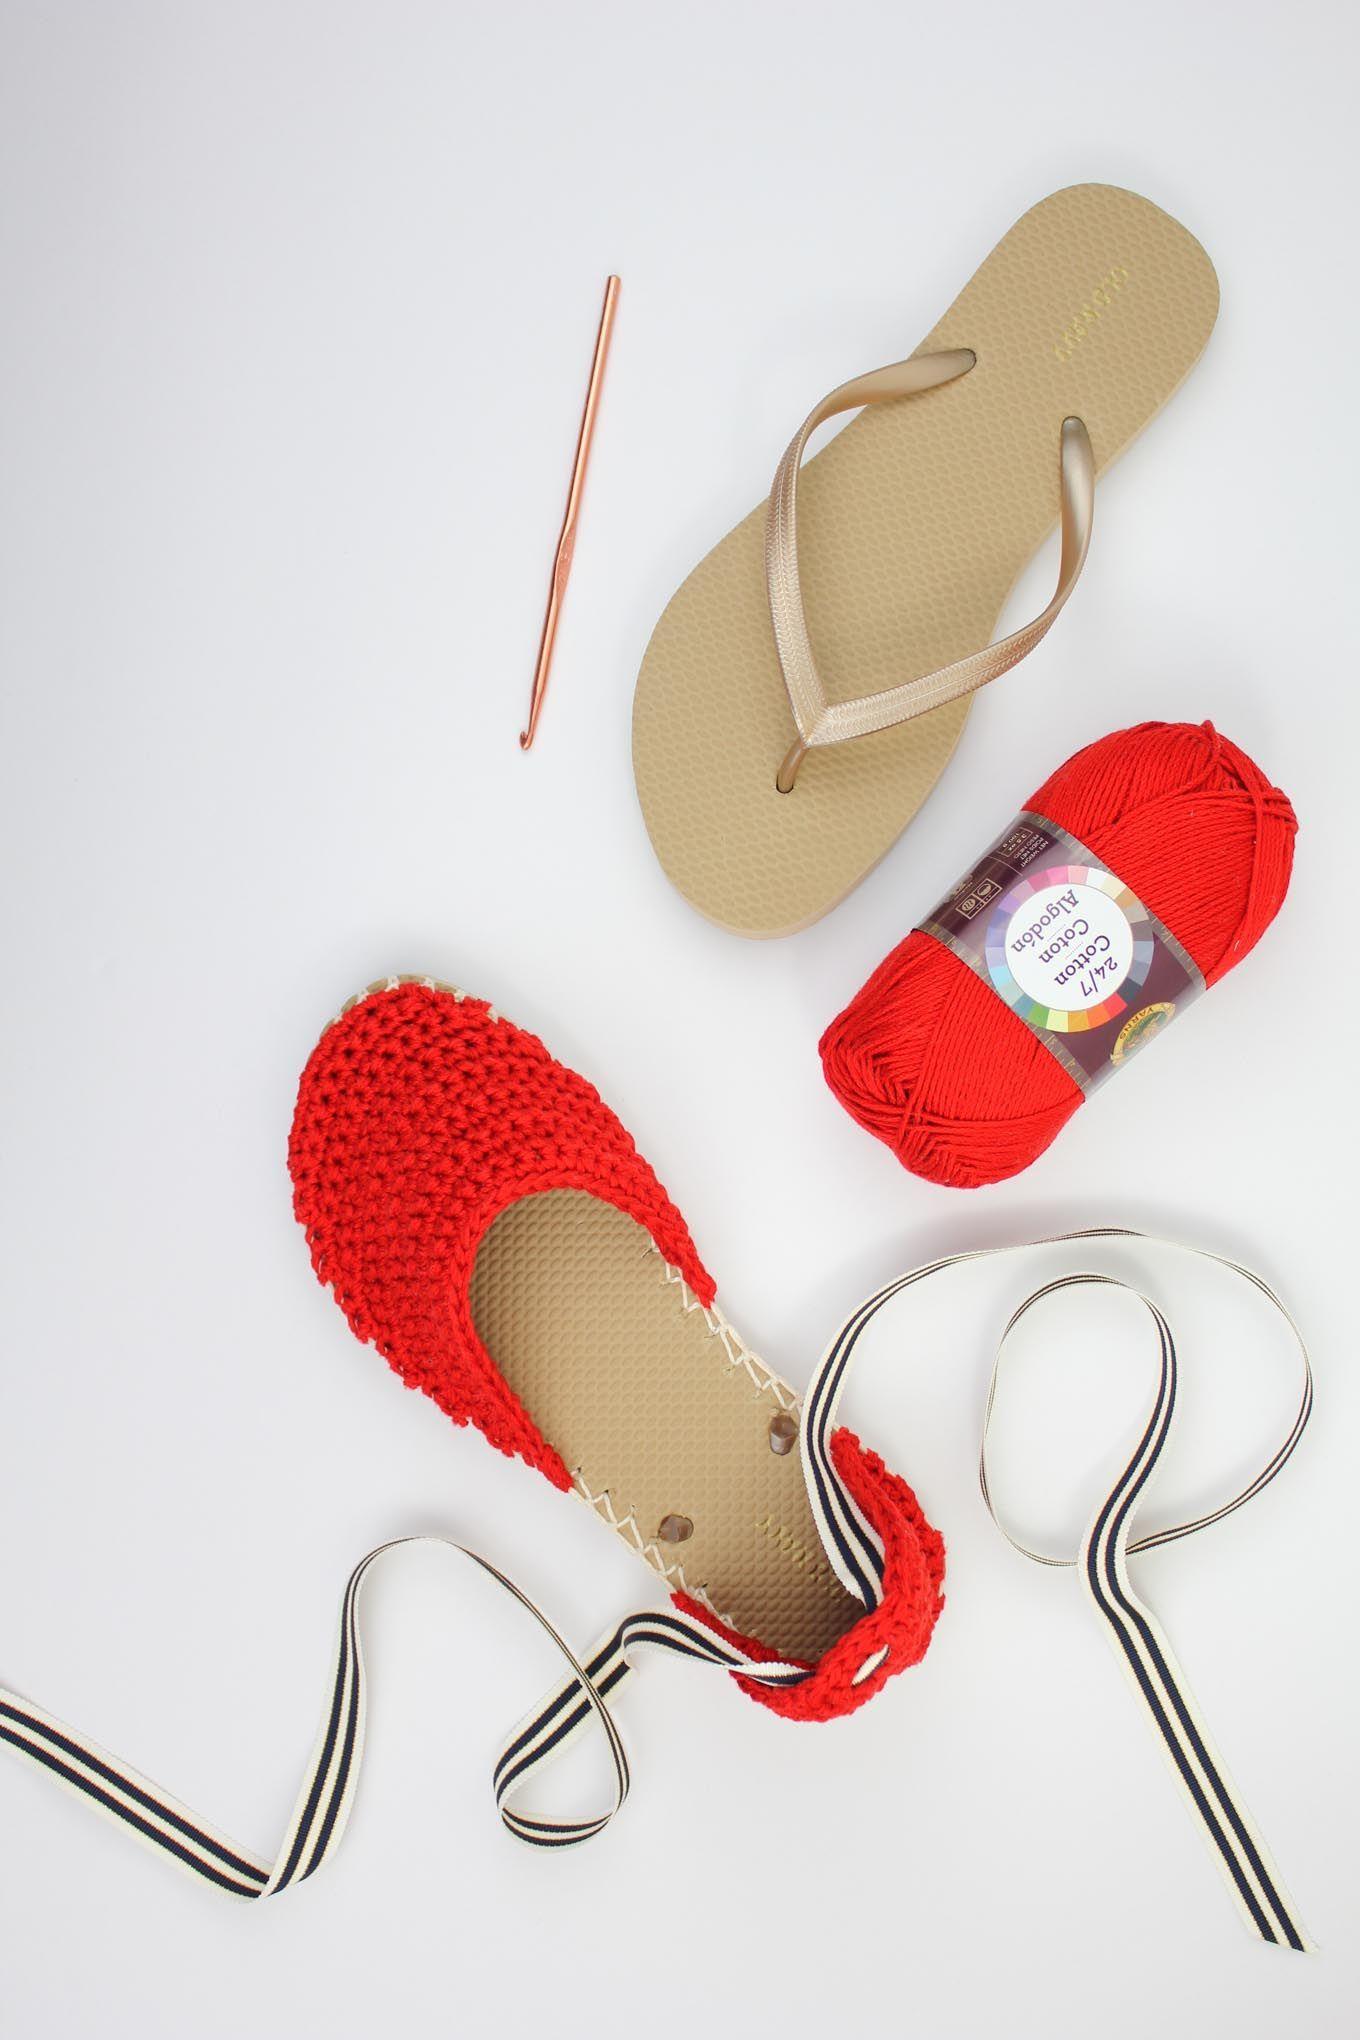 Make simple crochet espadrilles sandals